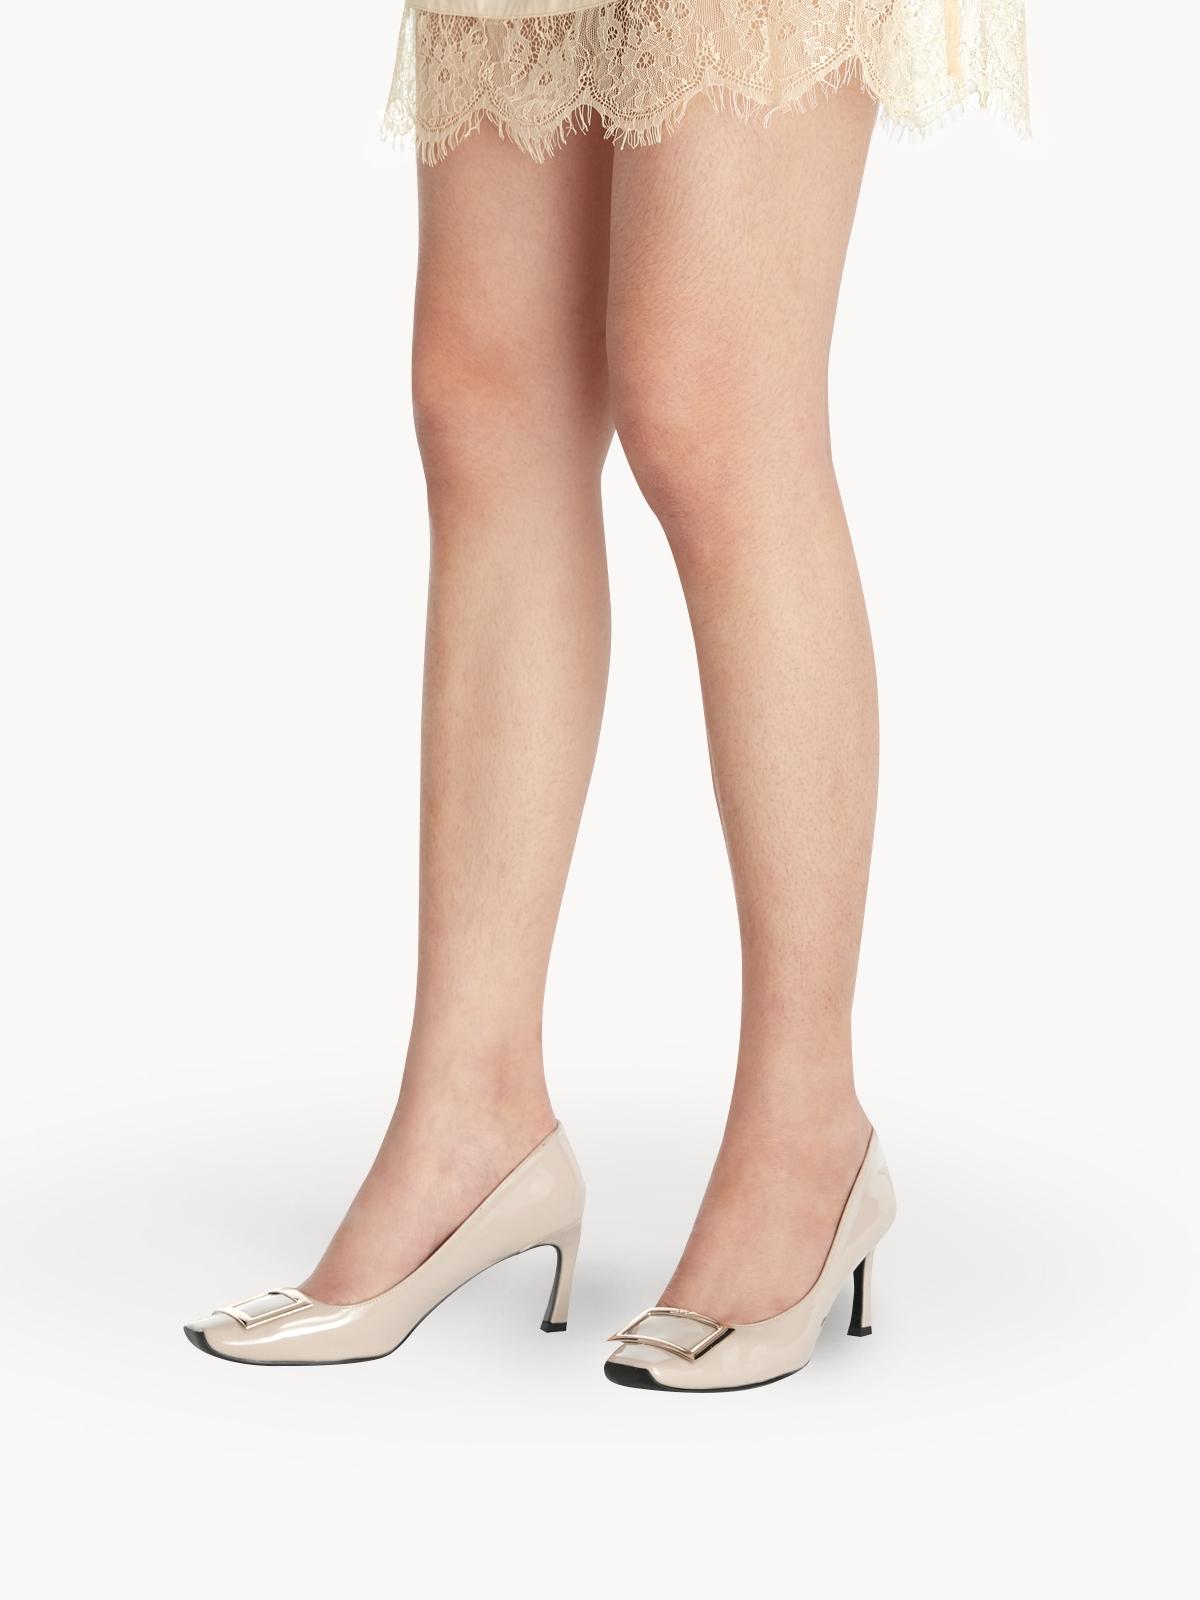 LookAtWe Stella Square Toe Heels Nude